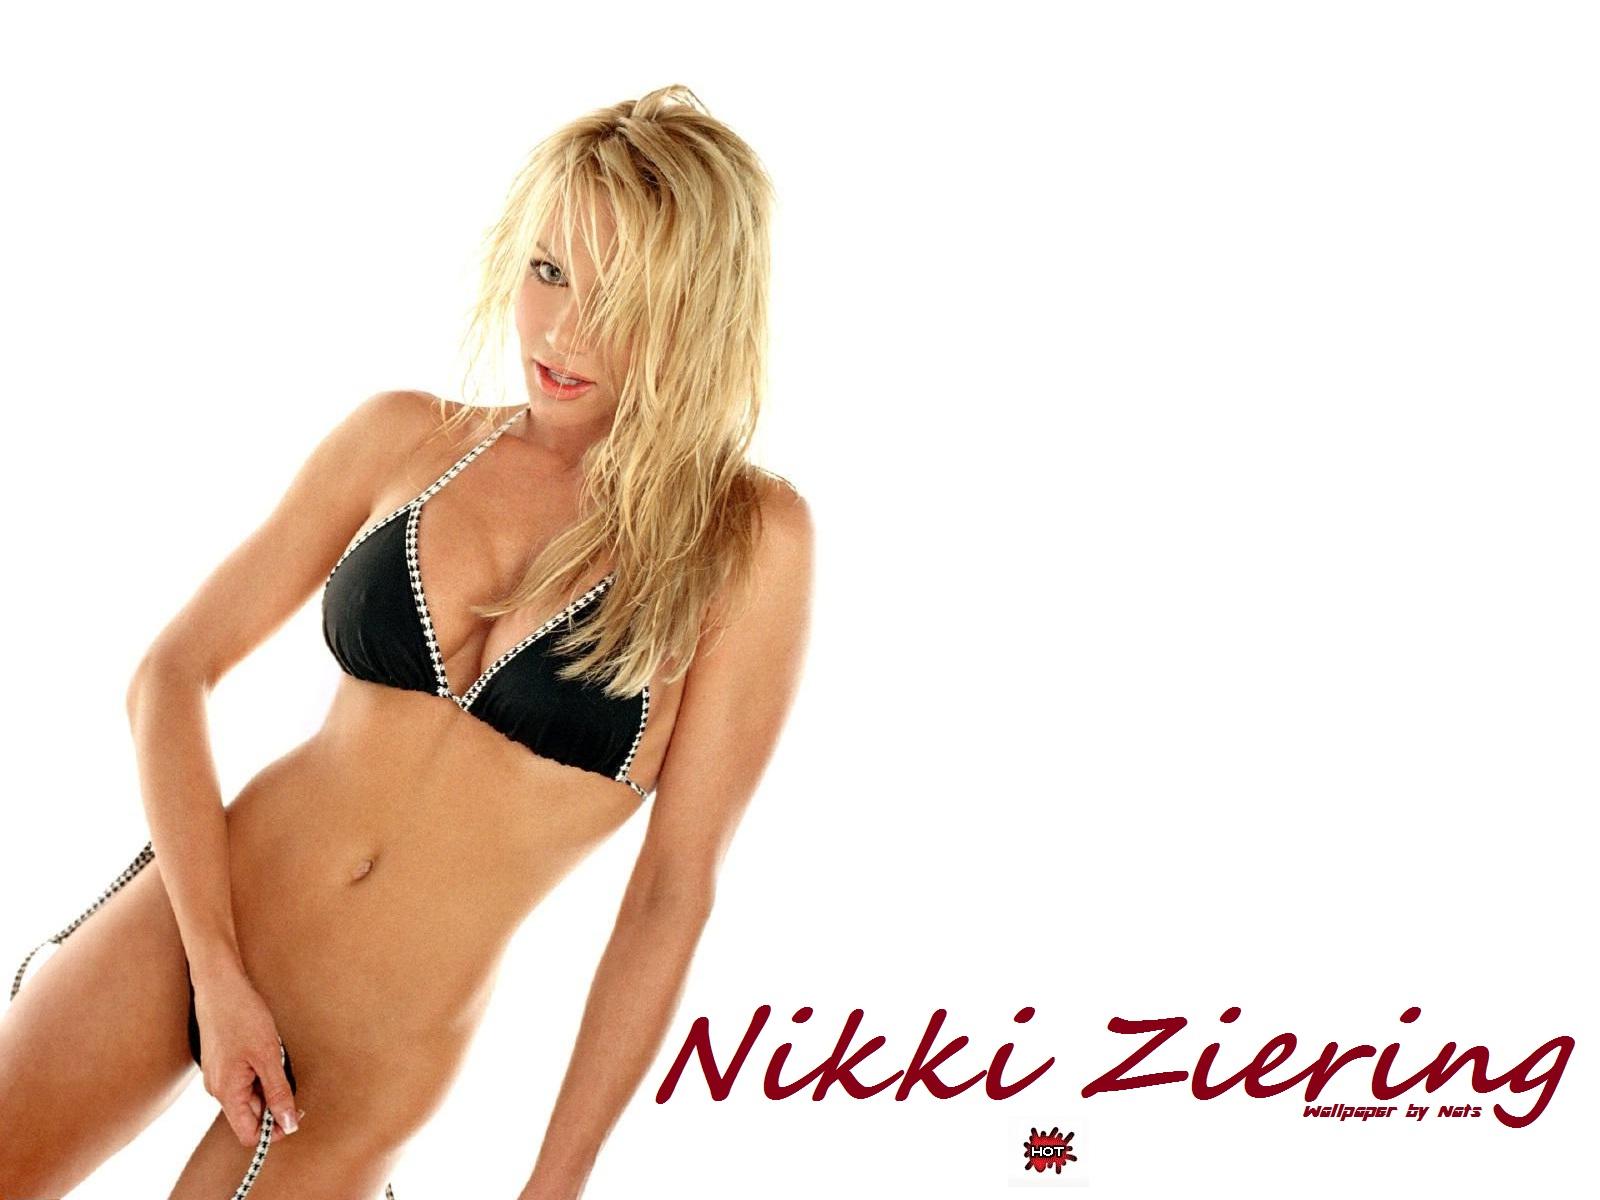 naked girls fucking naked girls fucking naked girls fucking naked